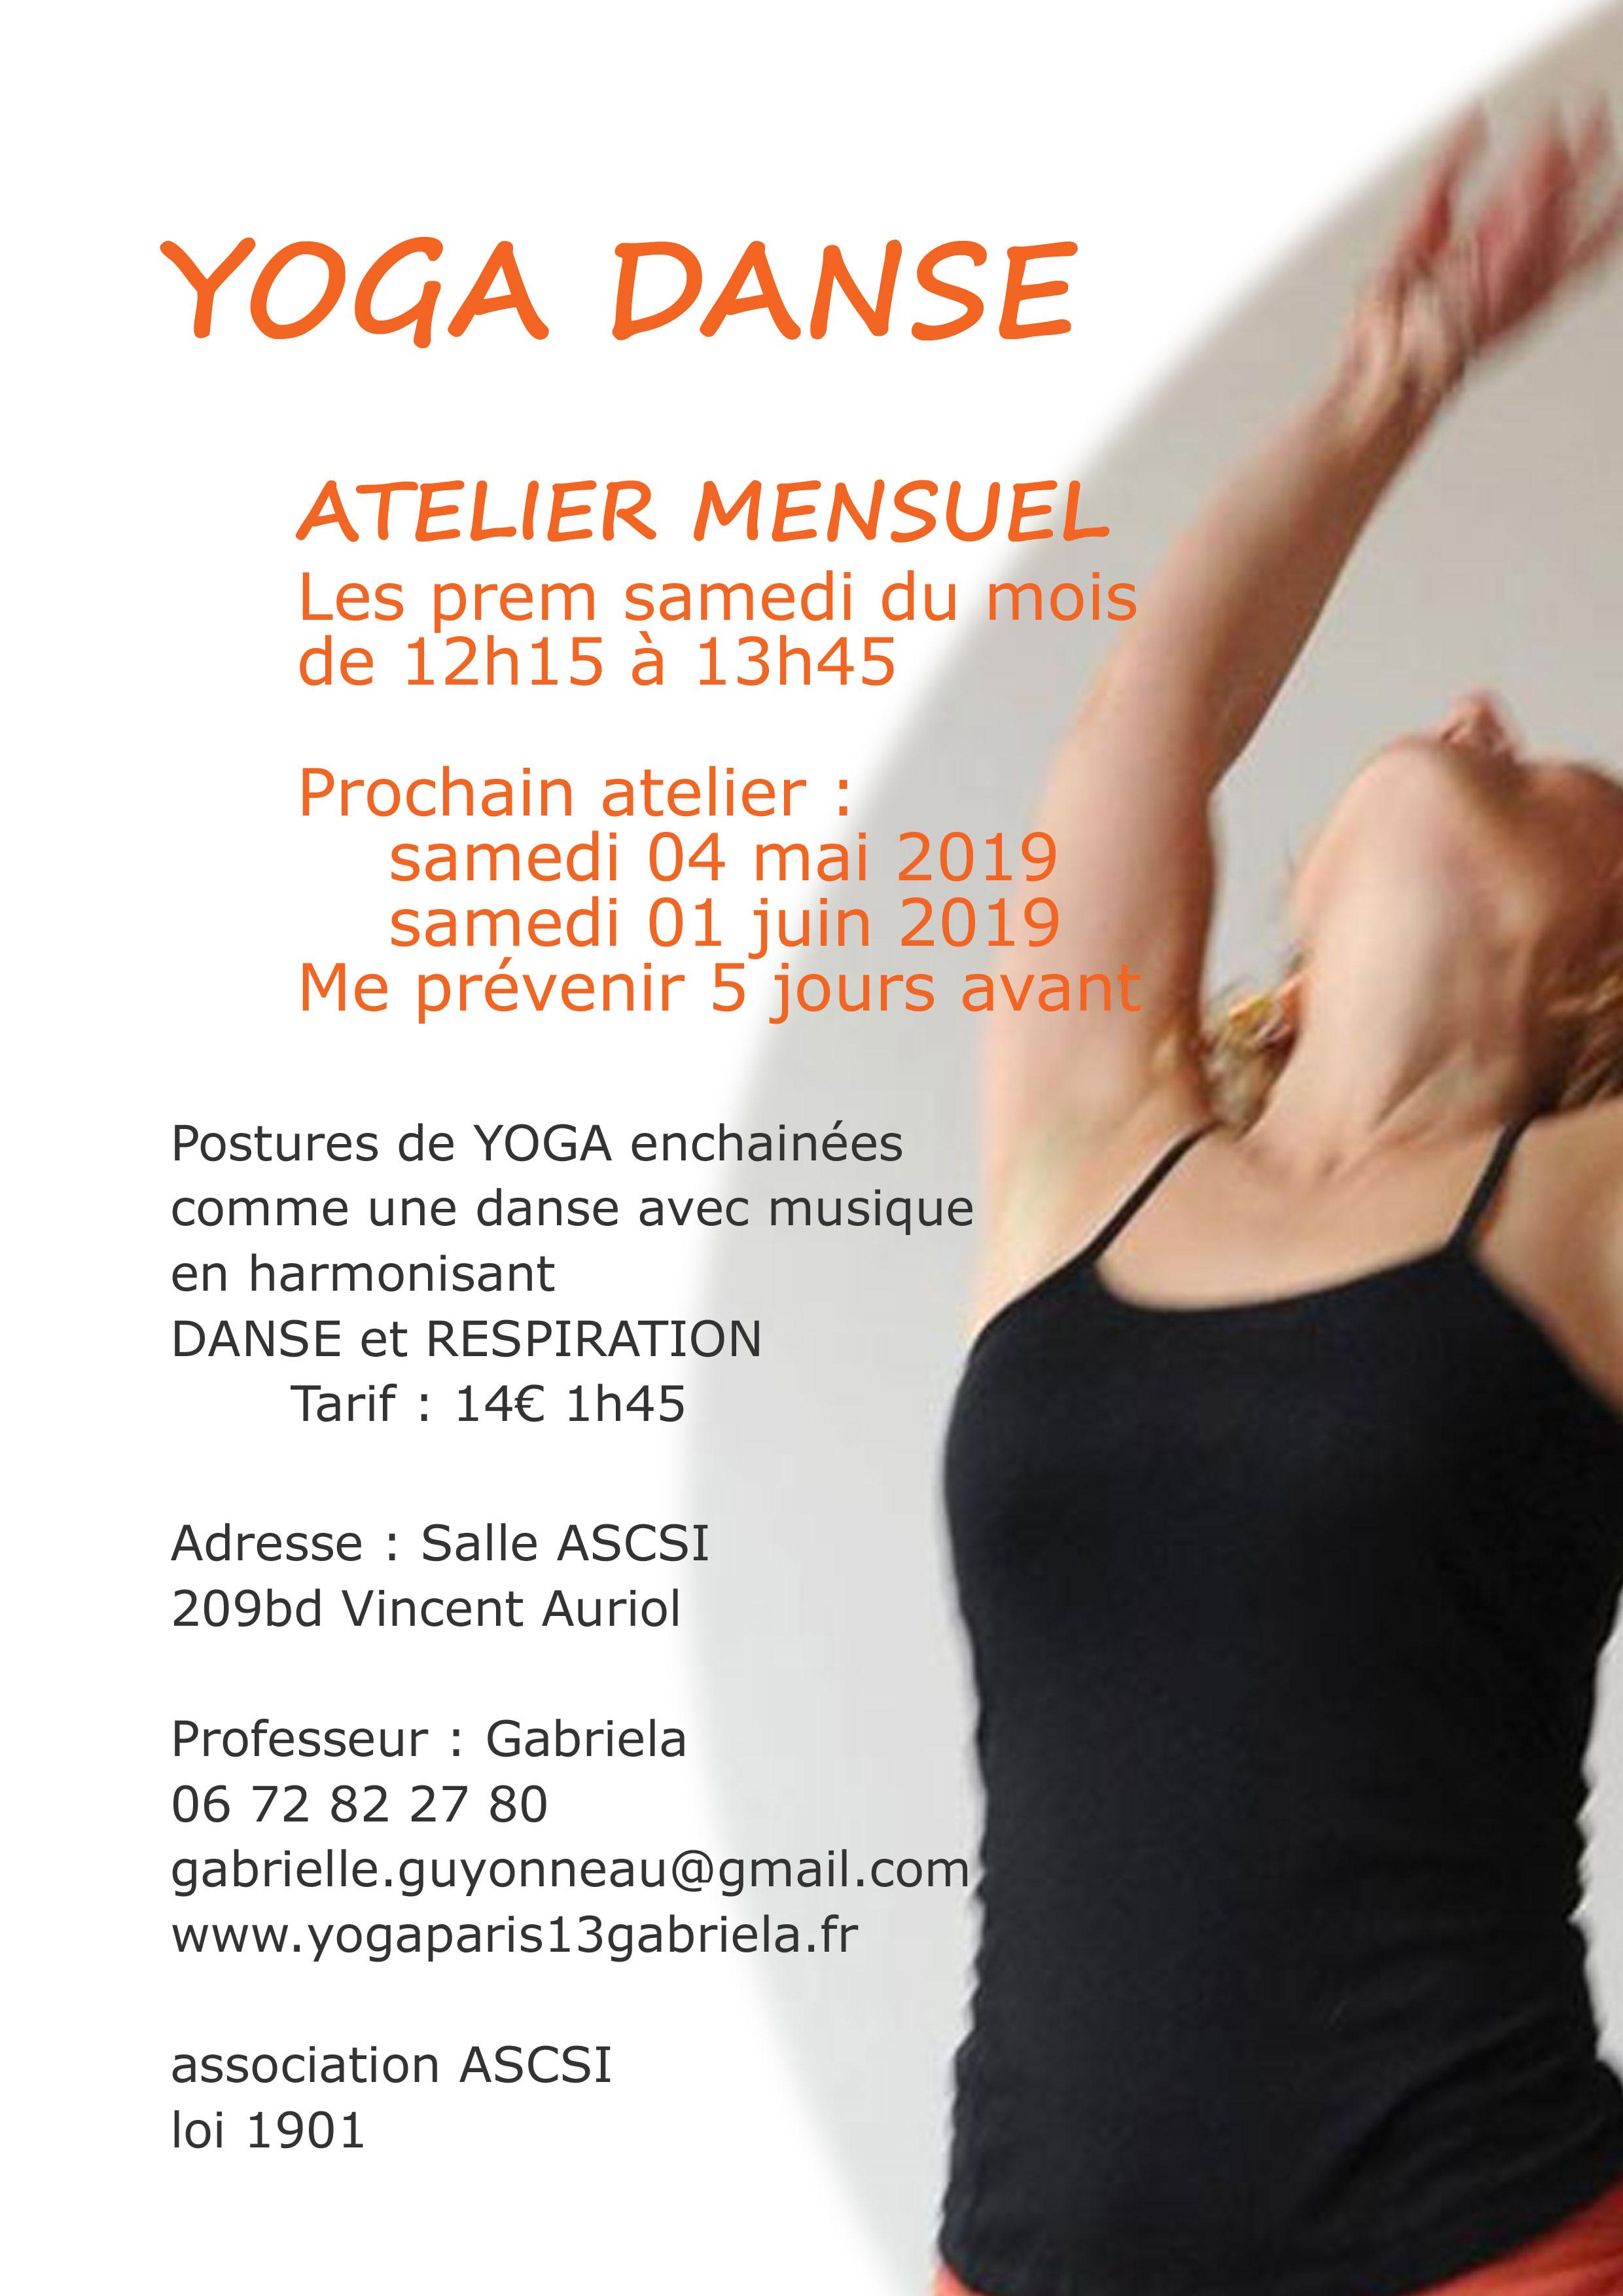 Atelier-mensuel-Yoga-Danse-15-04-19 NEW